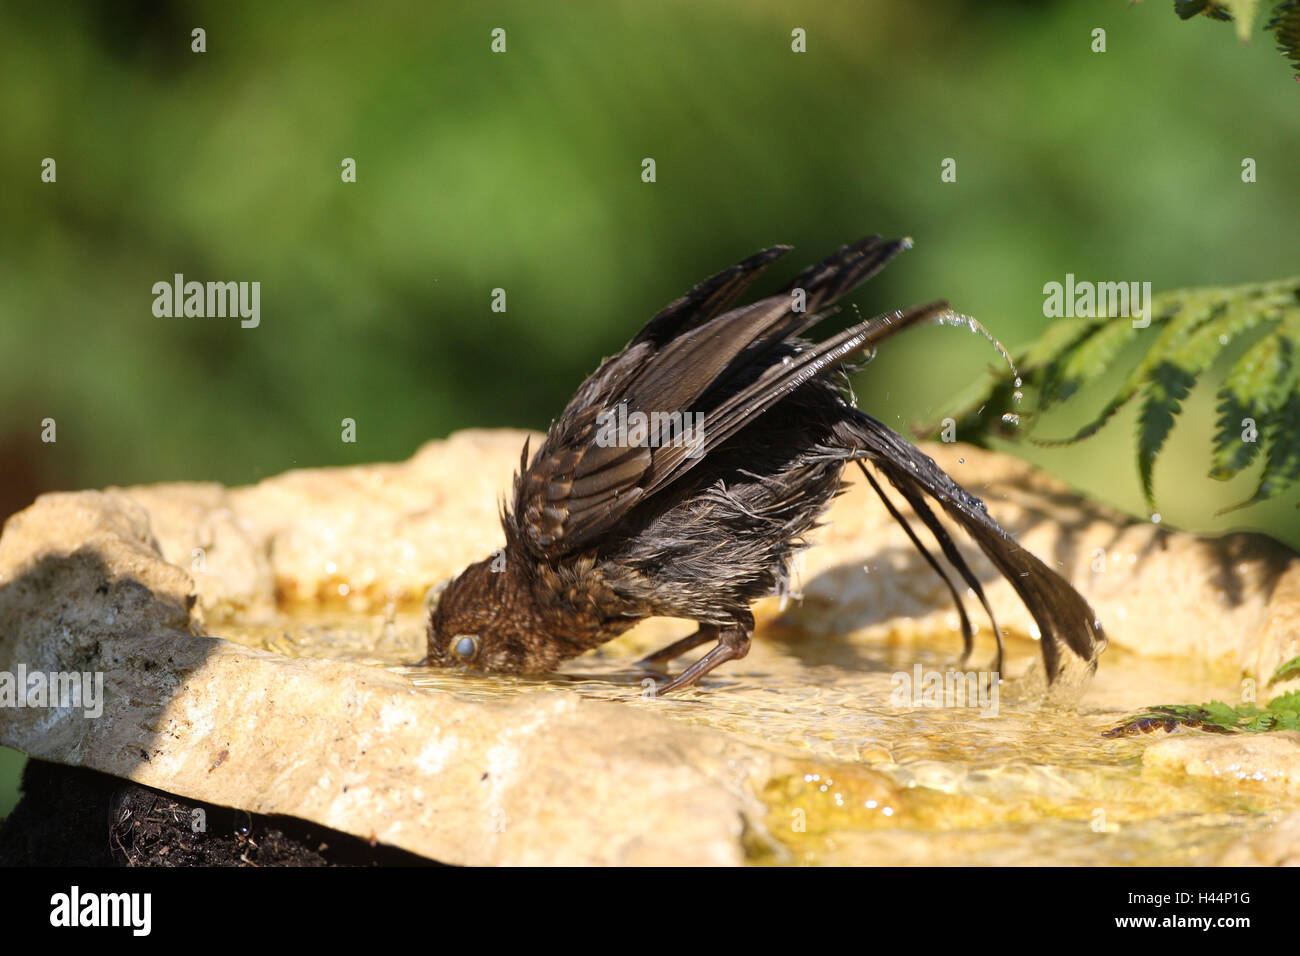 Blackbird has of a bath in bird's drinks, - Stock Image